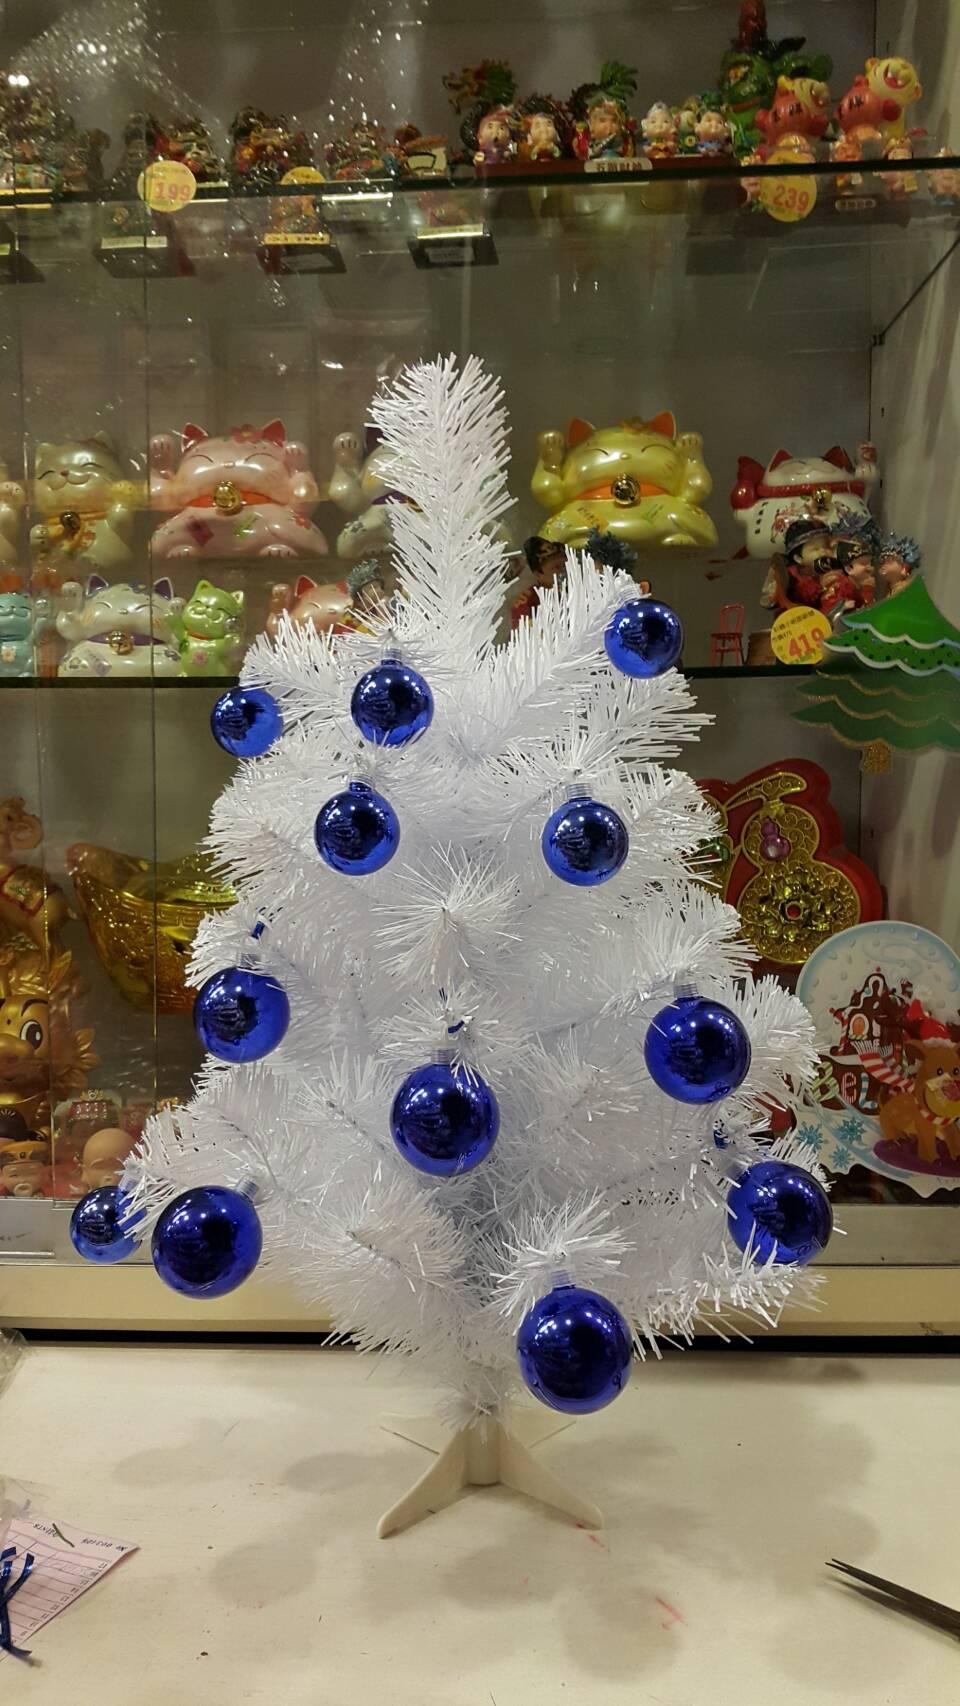 X射線【X070002】2呎成品圓頭樹-白(含深藍鍍金球),聖誕樹/聖誕佈置/聖誕/茂密樹